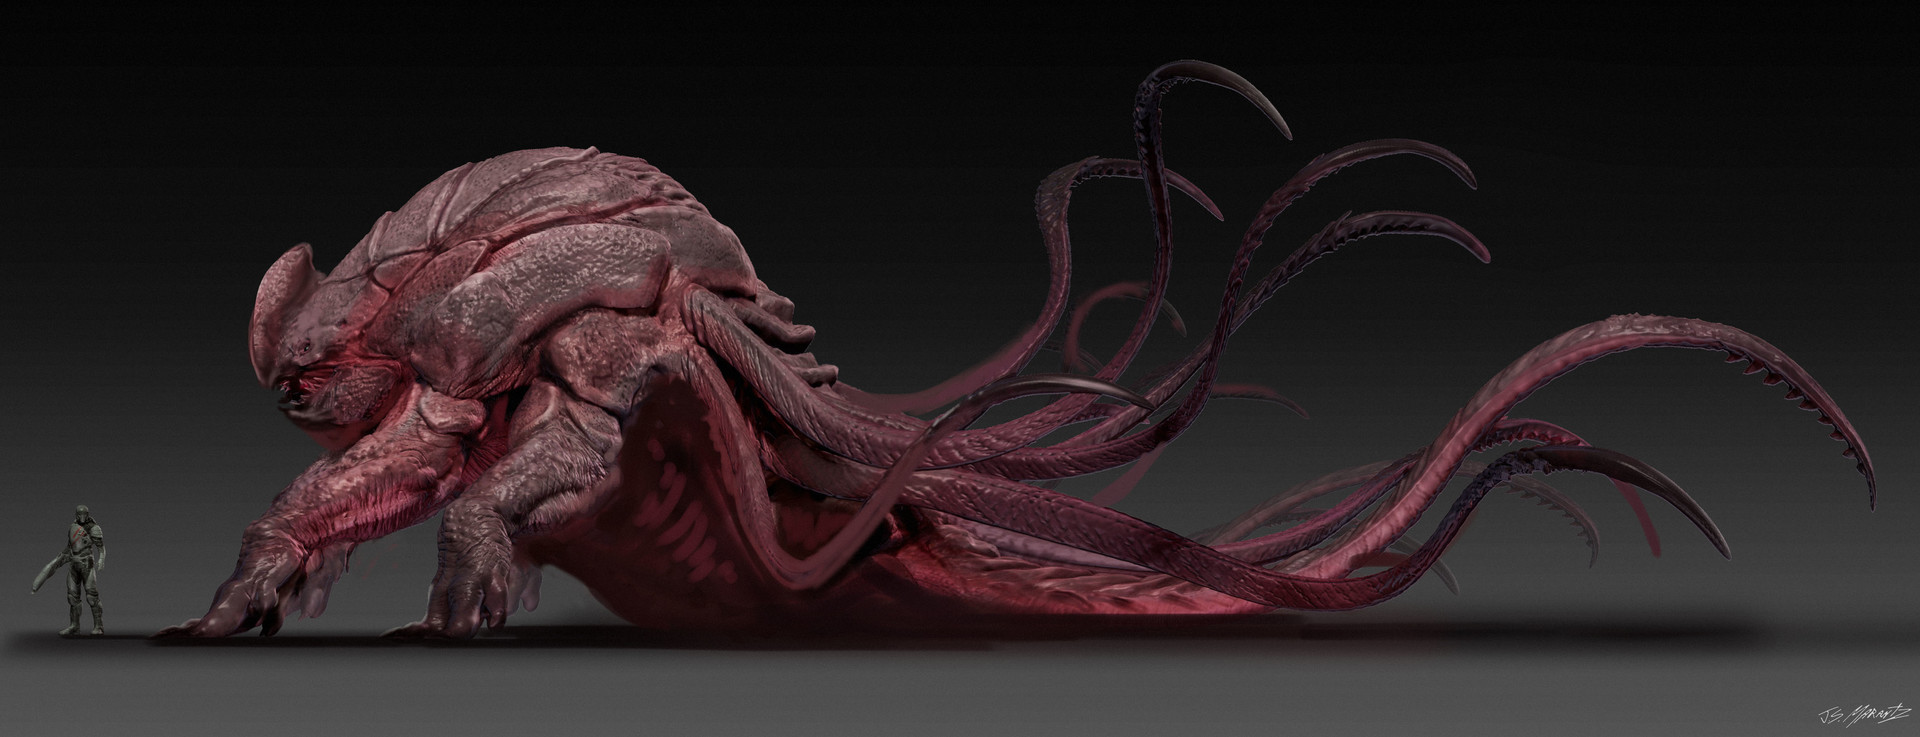 Jerx marantz monster variation 1